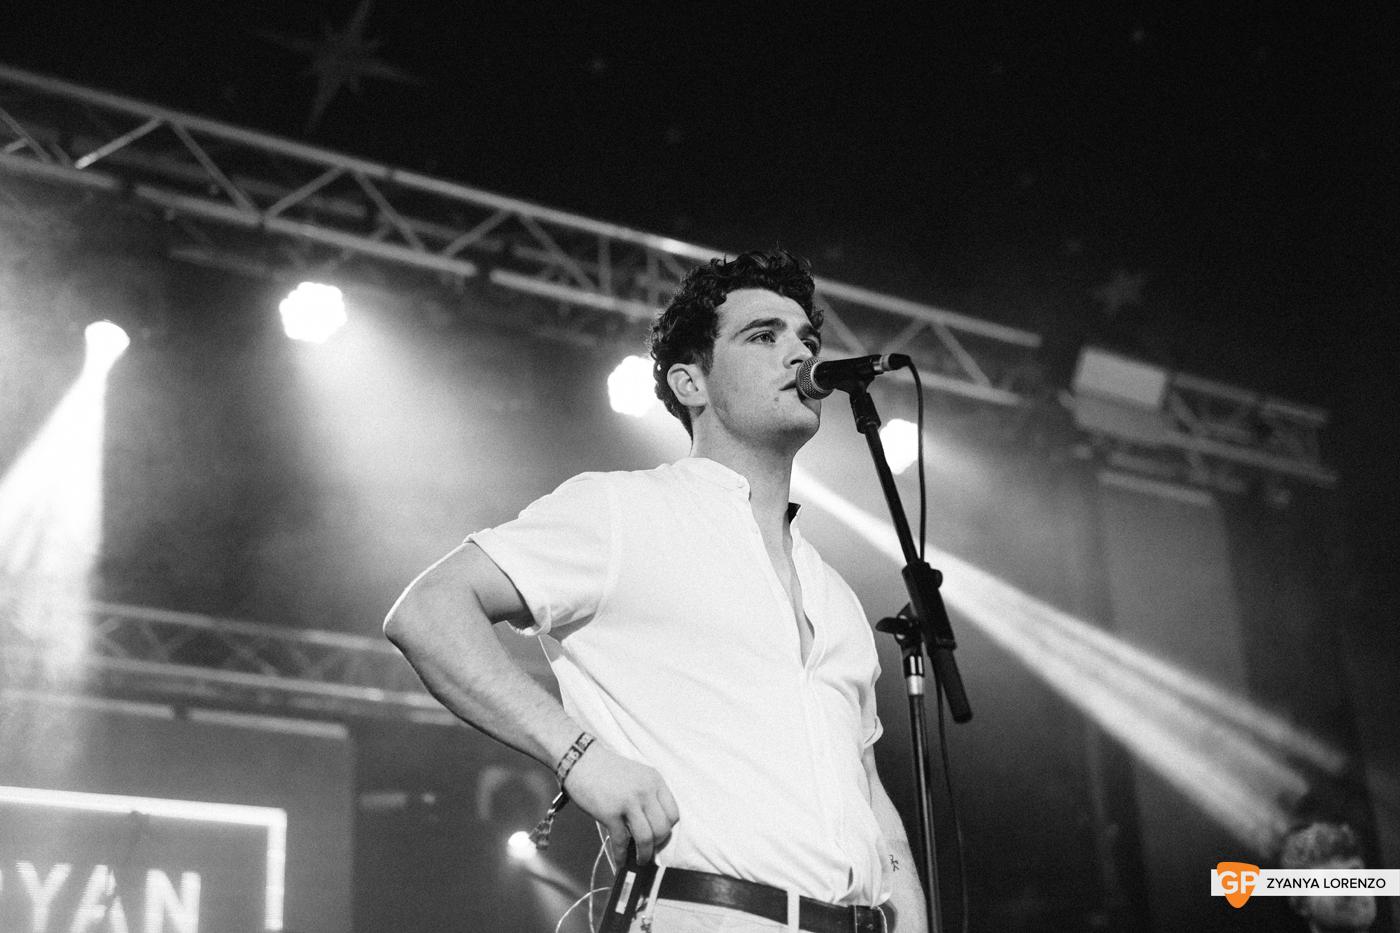 Ryan Mack live at Independence, Cork. Photographed by Zyanya Lorenzo.